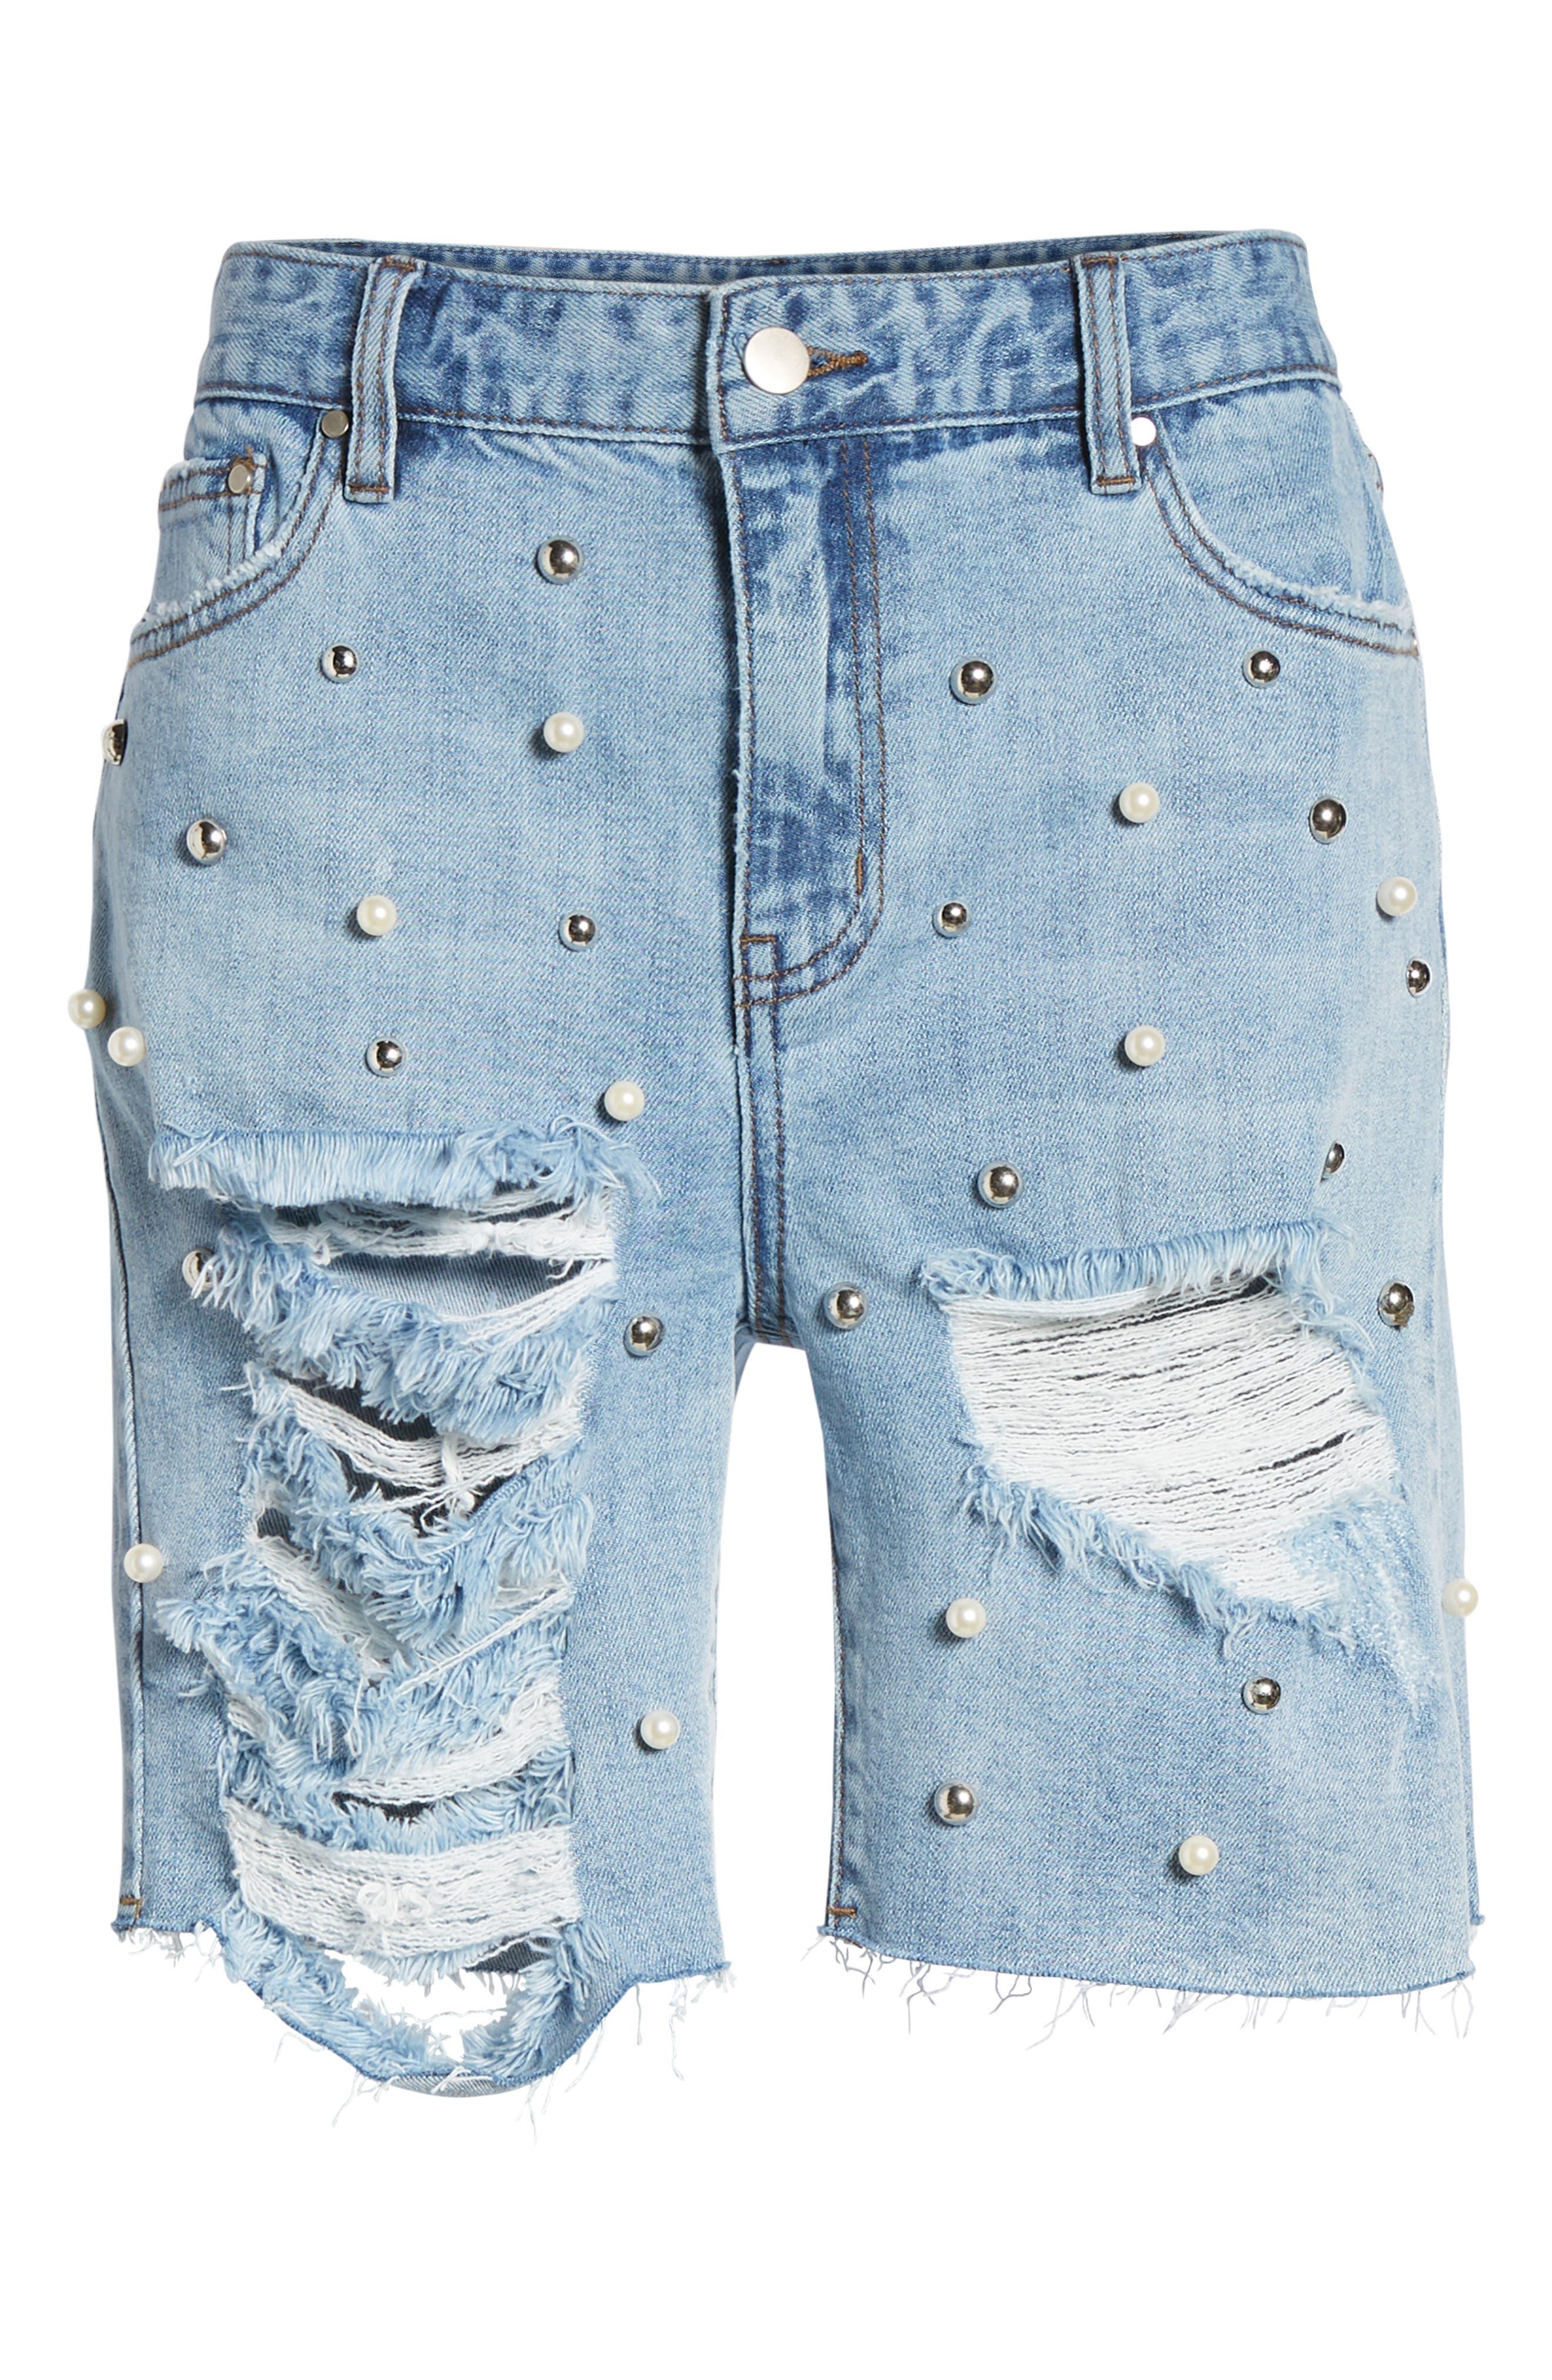 Imitation Pearl & Stud Ripped Denim Bermuda Shorts,                             Alternate thumbnail 7, color,                             Vintage Malibu